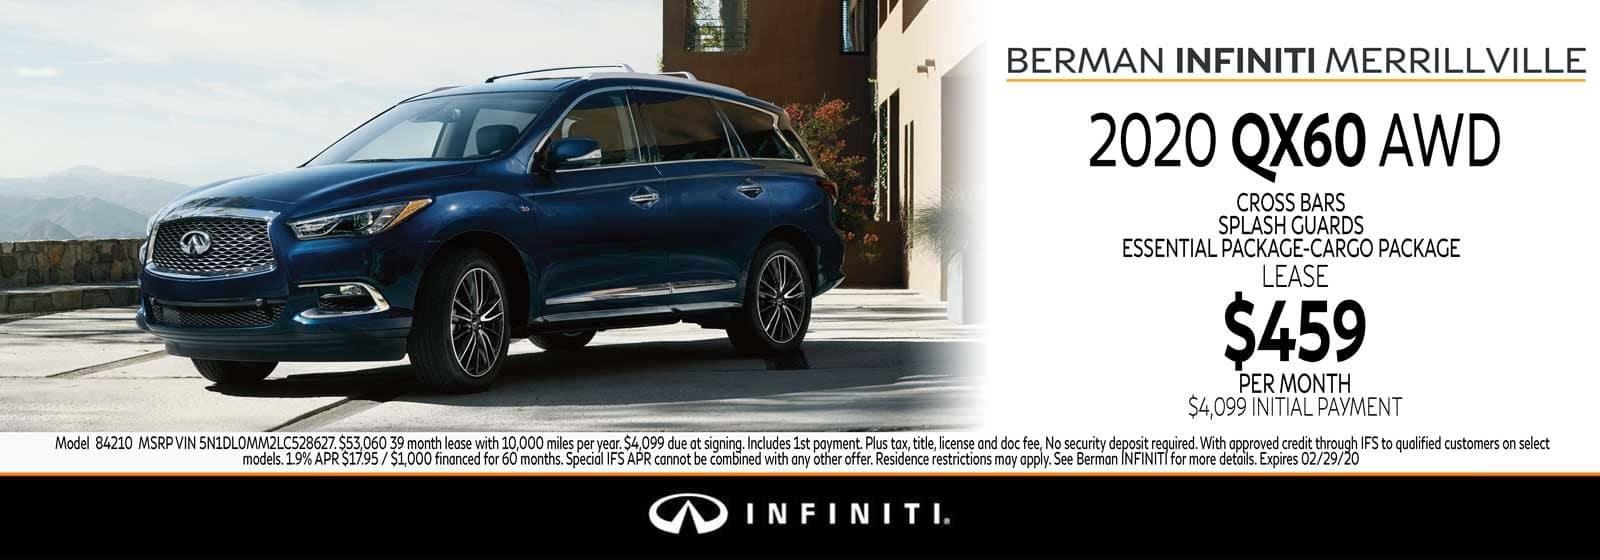 New 2020 INFINITI QX60 February Offer at Berman INFINITI of Merrillville!